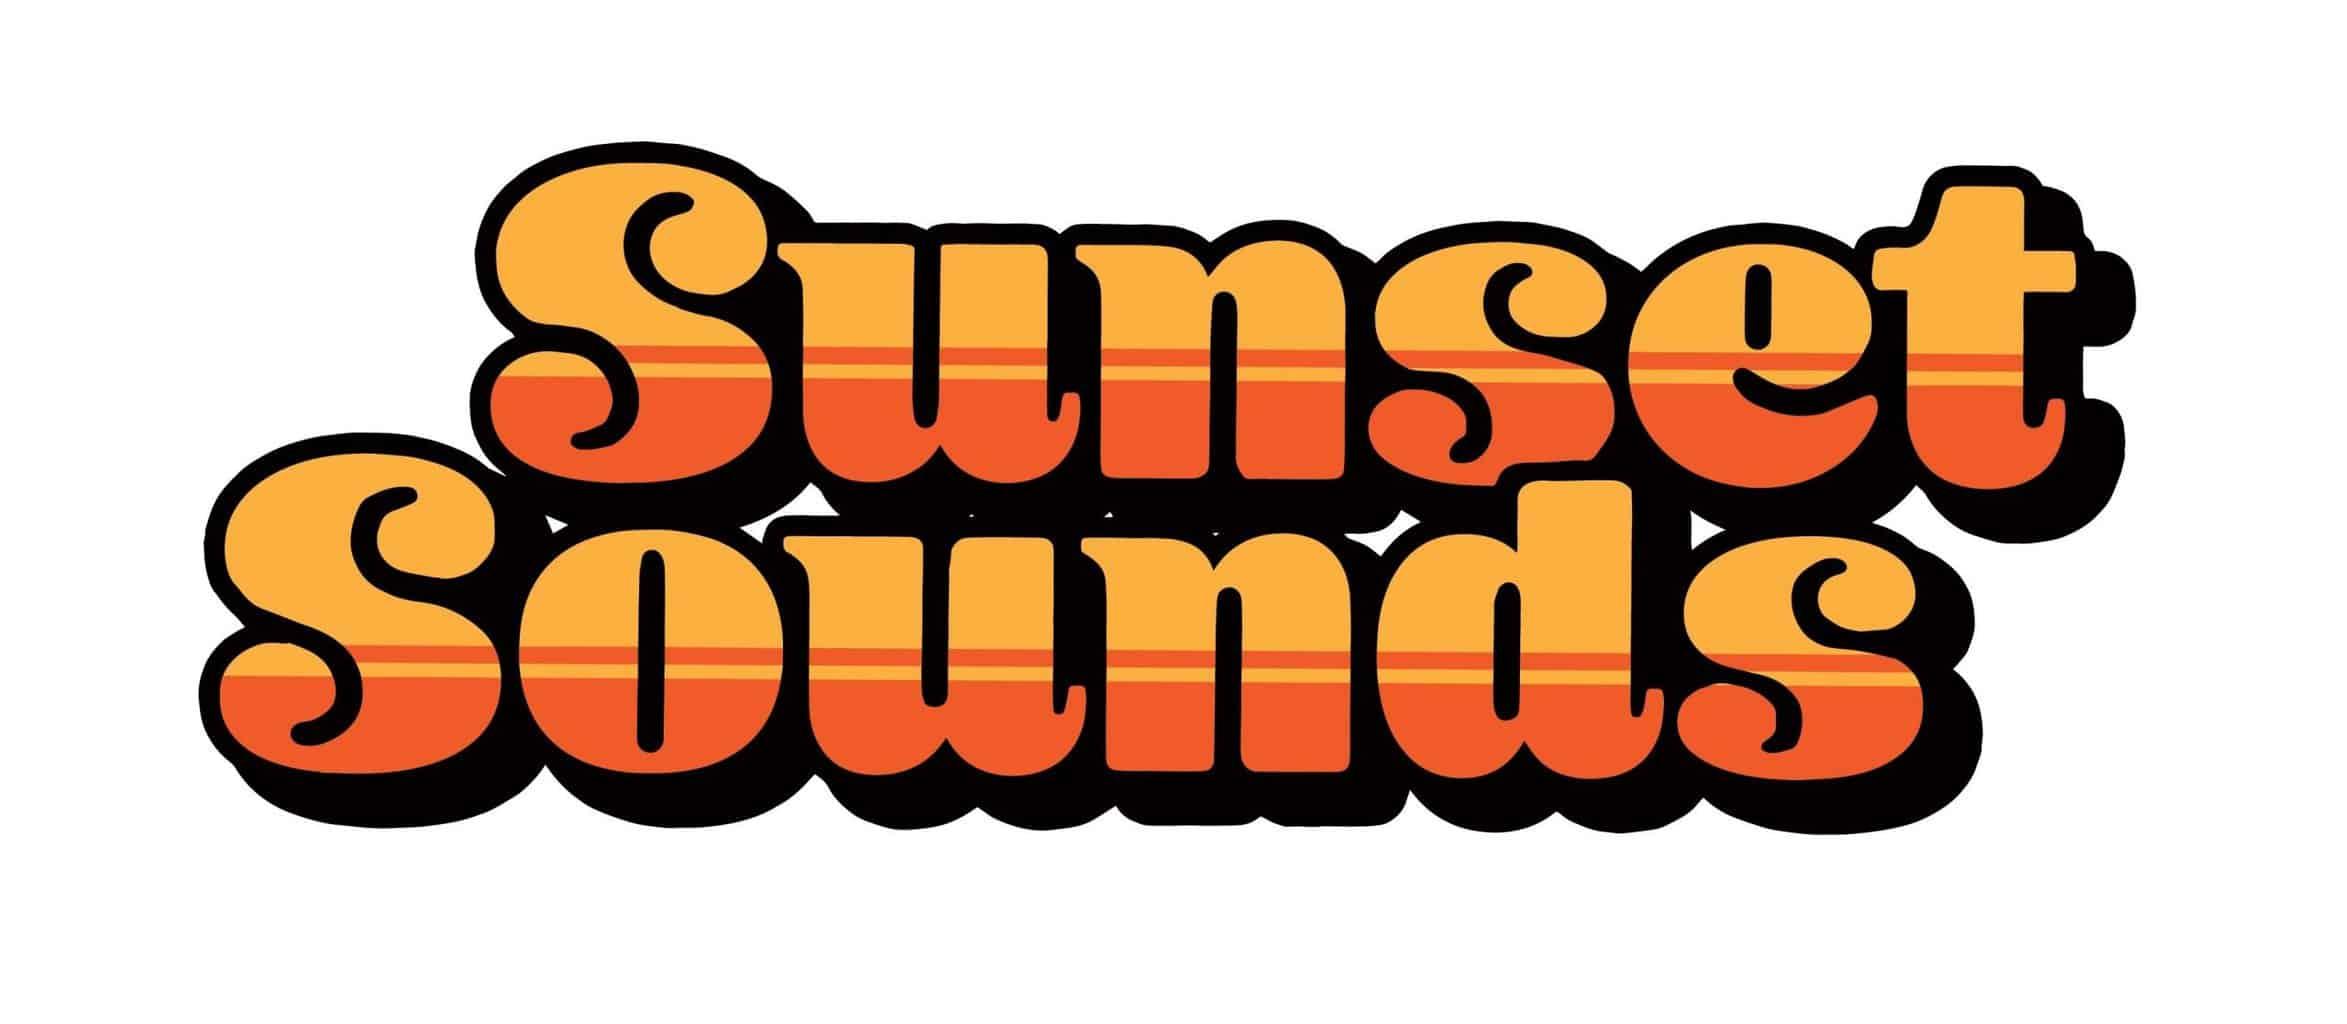 Scene News: SUNSET SOUNDS SET TO DELIGHT HASTINGS FORESHORE RESERVE ON NOVEMBER 28, 2021